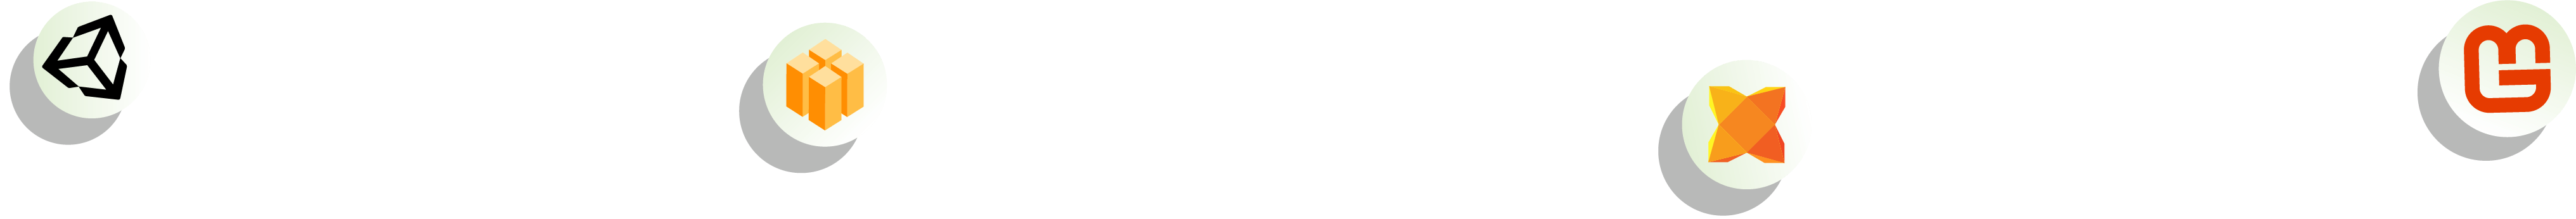 game-development-2-elements-1